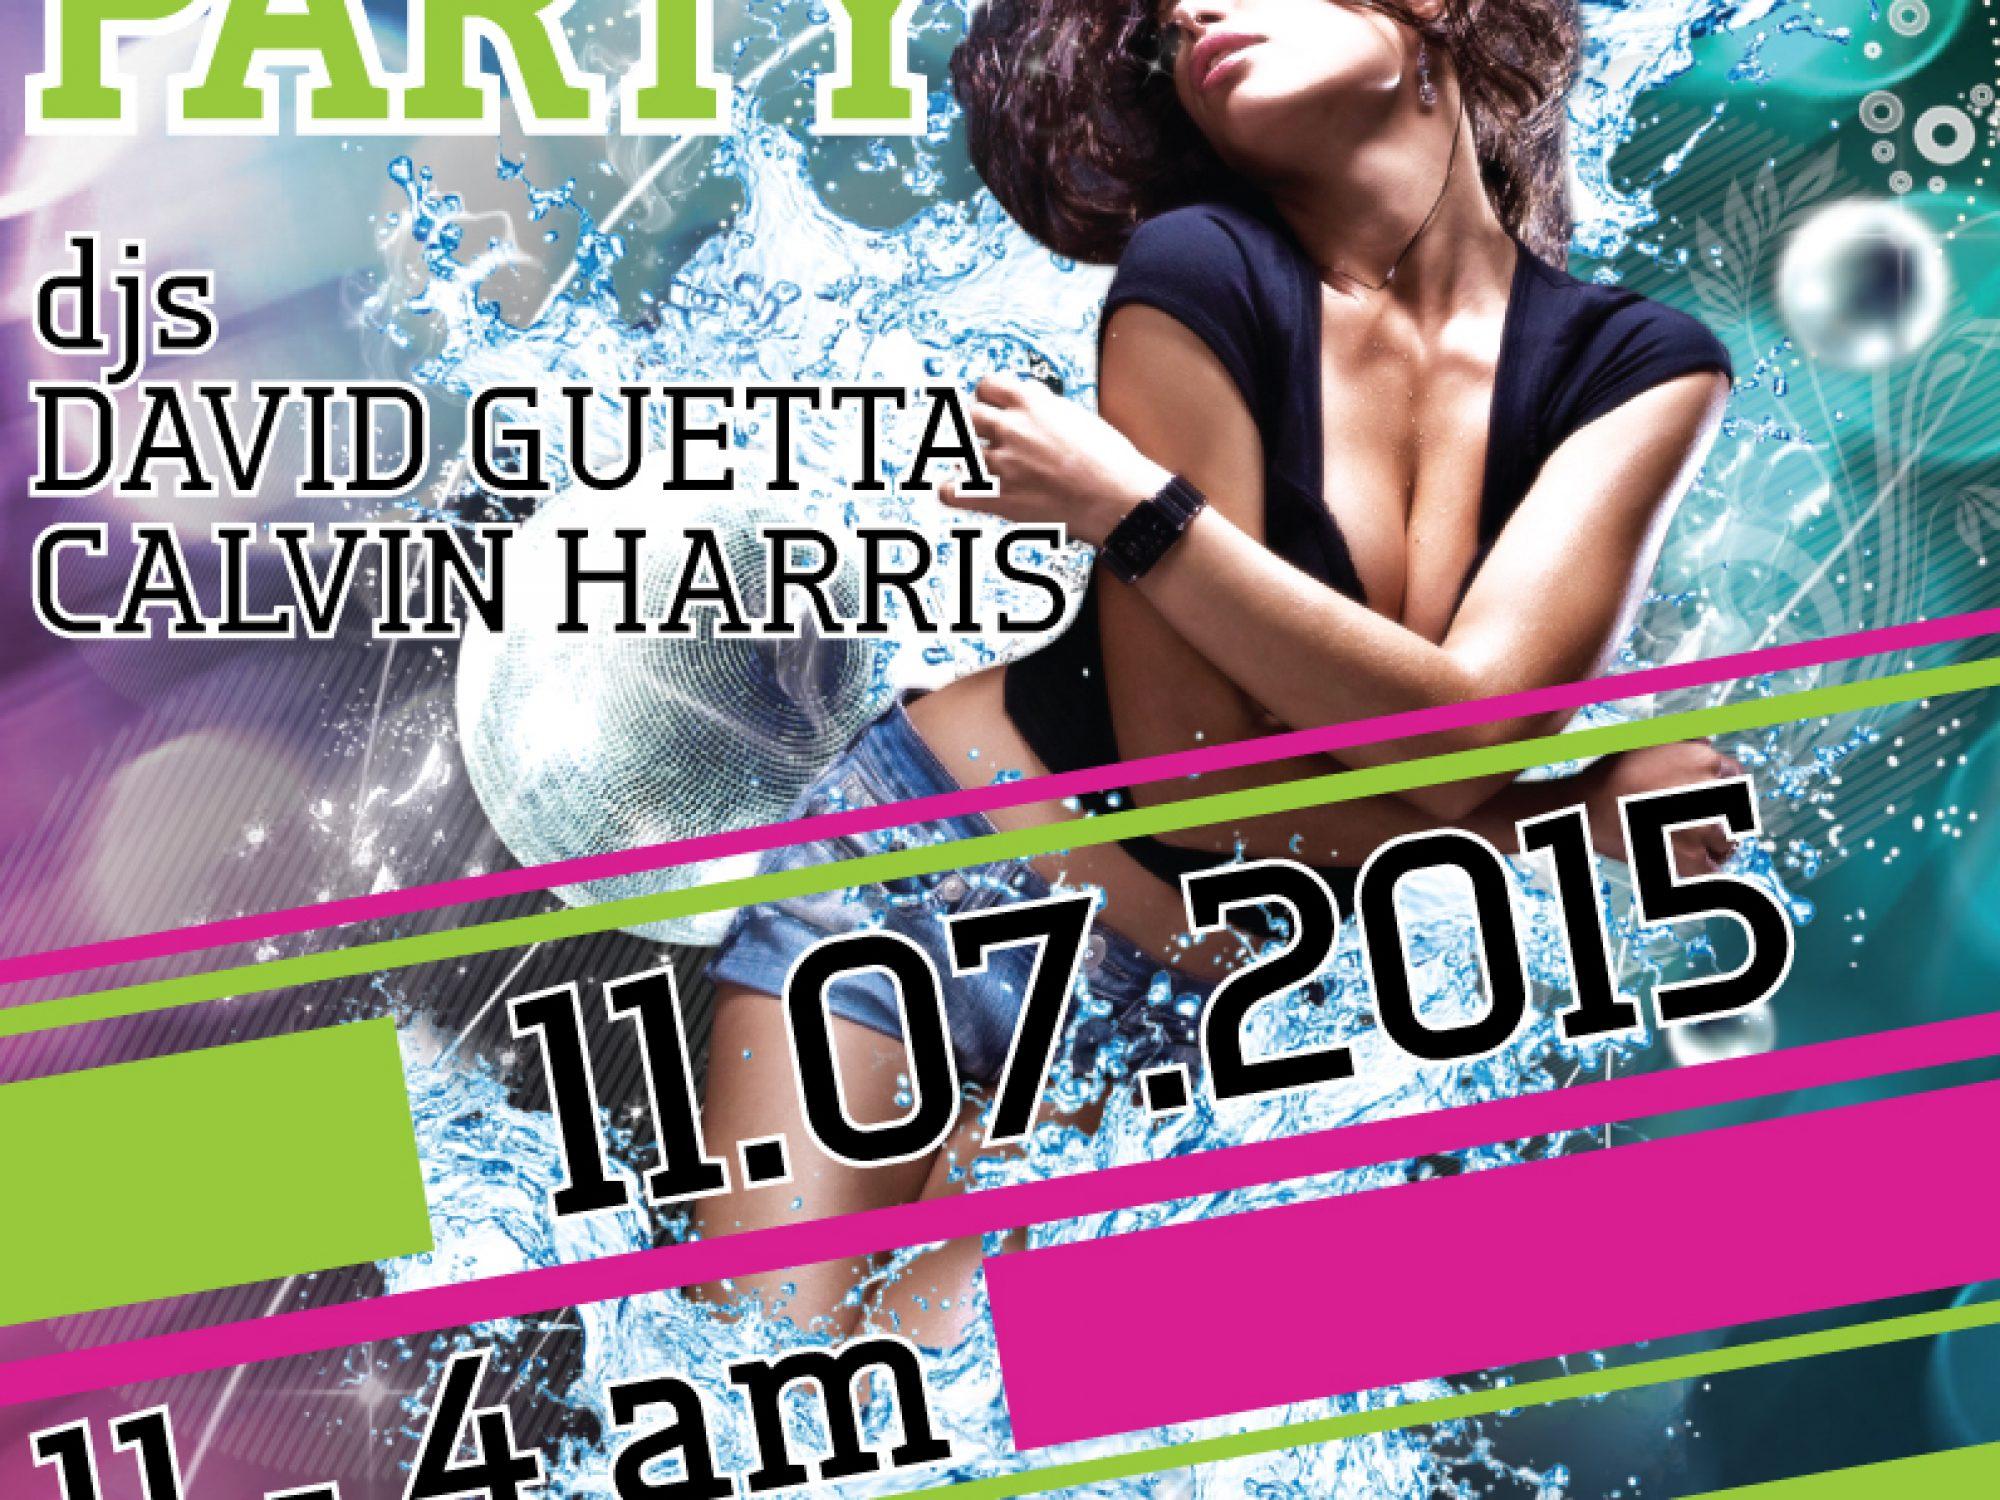 Flyer for Nightclub